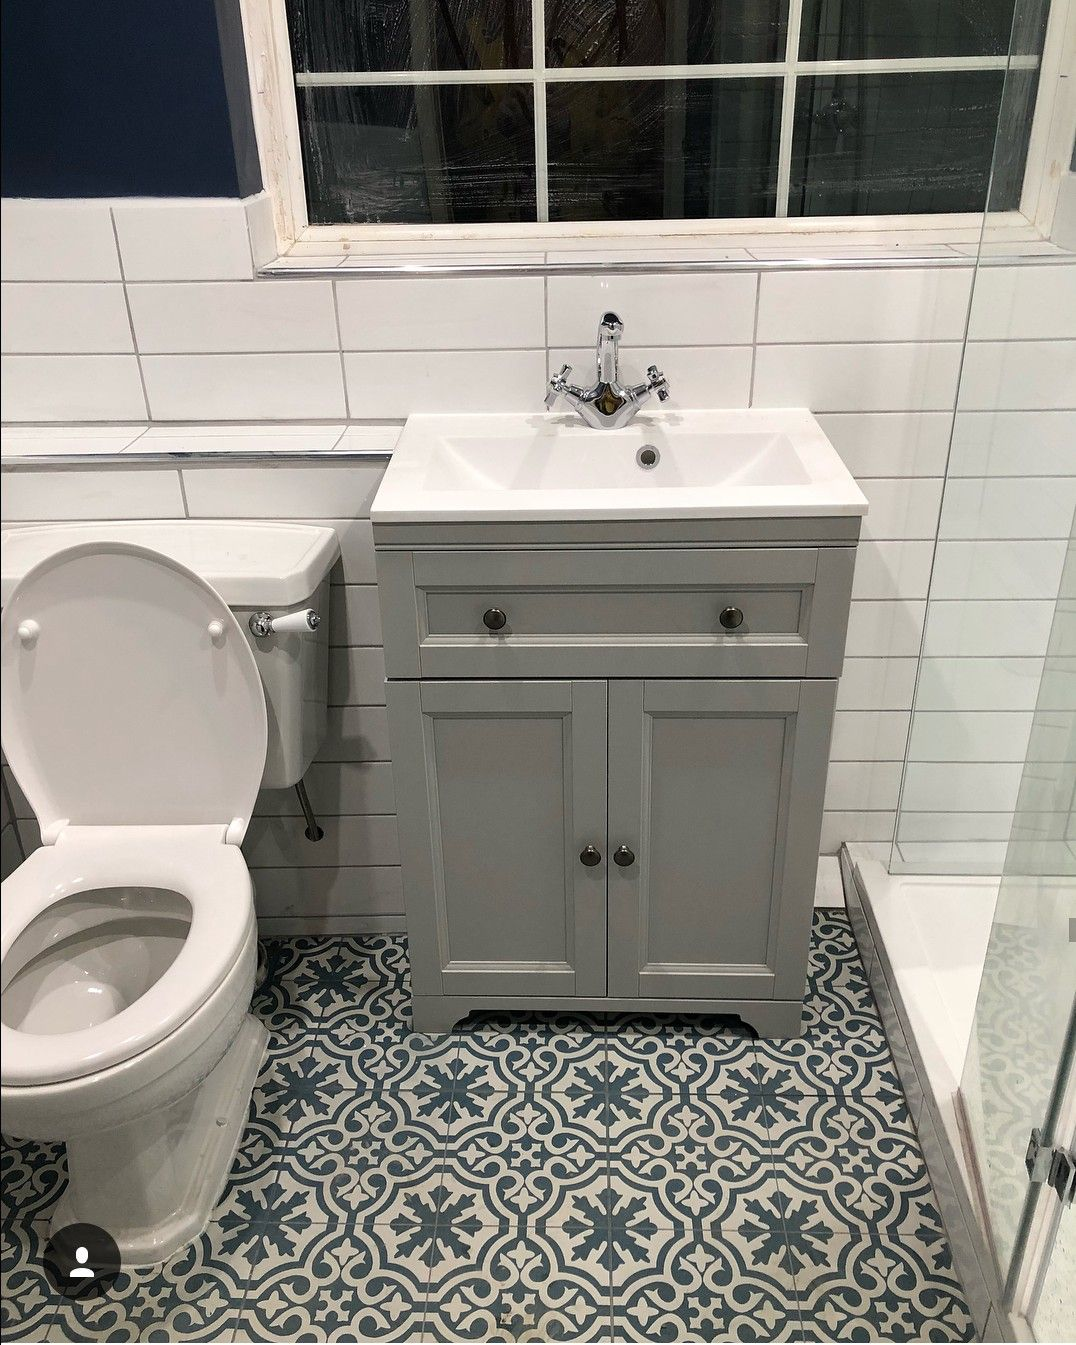 Linear White Wall Tile And Berkeley Blue Floor Tile Small Toilet Room Victorian Bathroom Blue Bathroom Tile